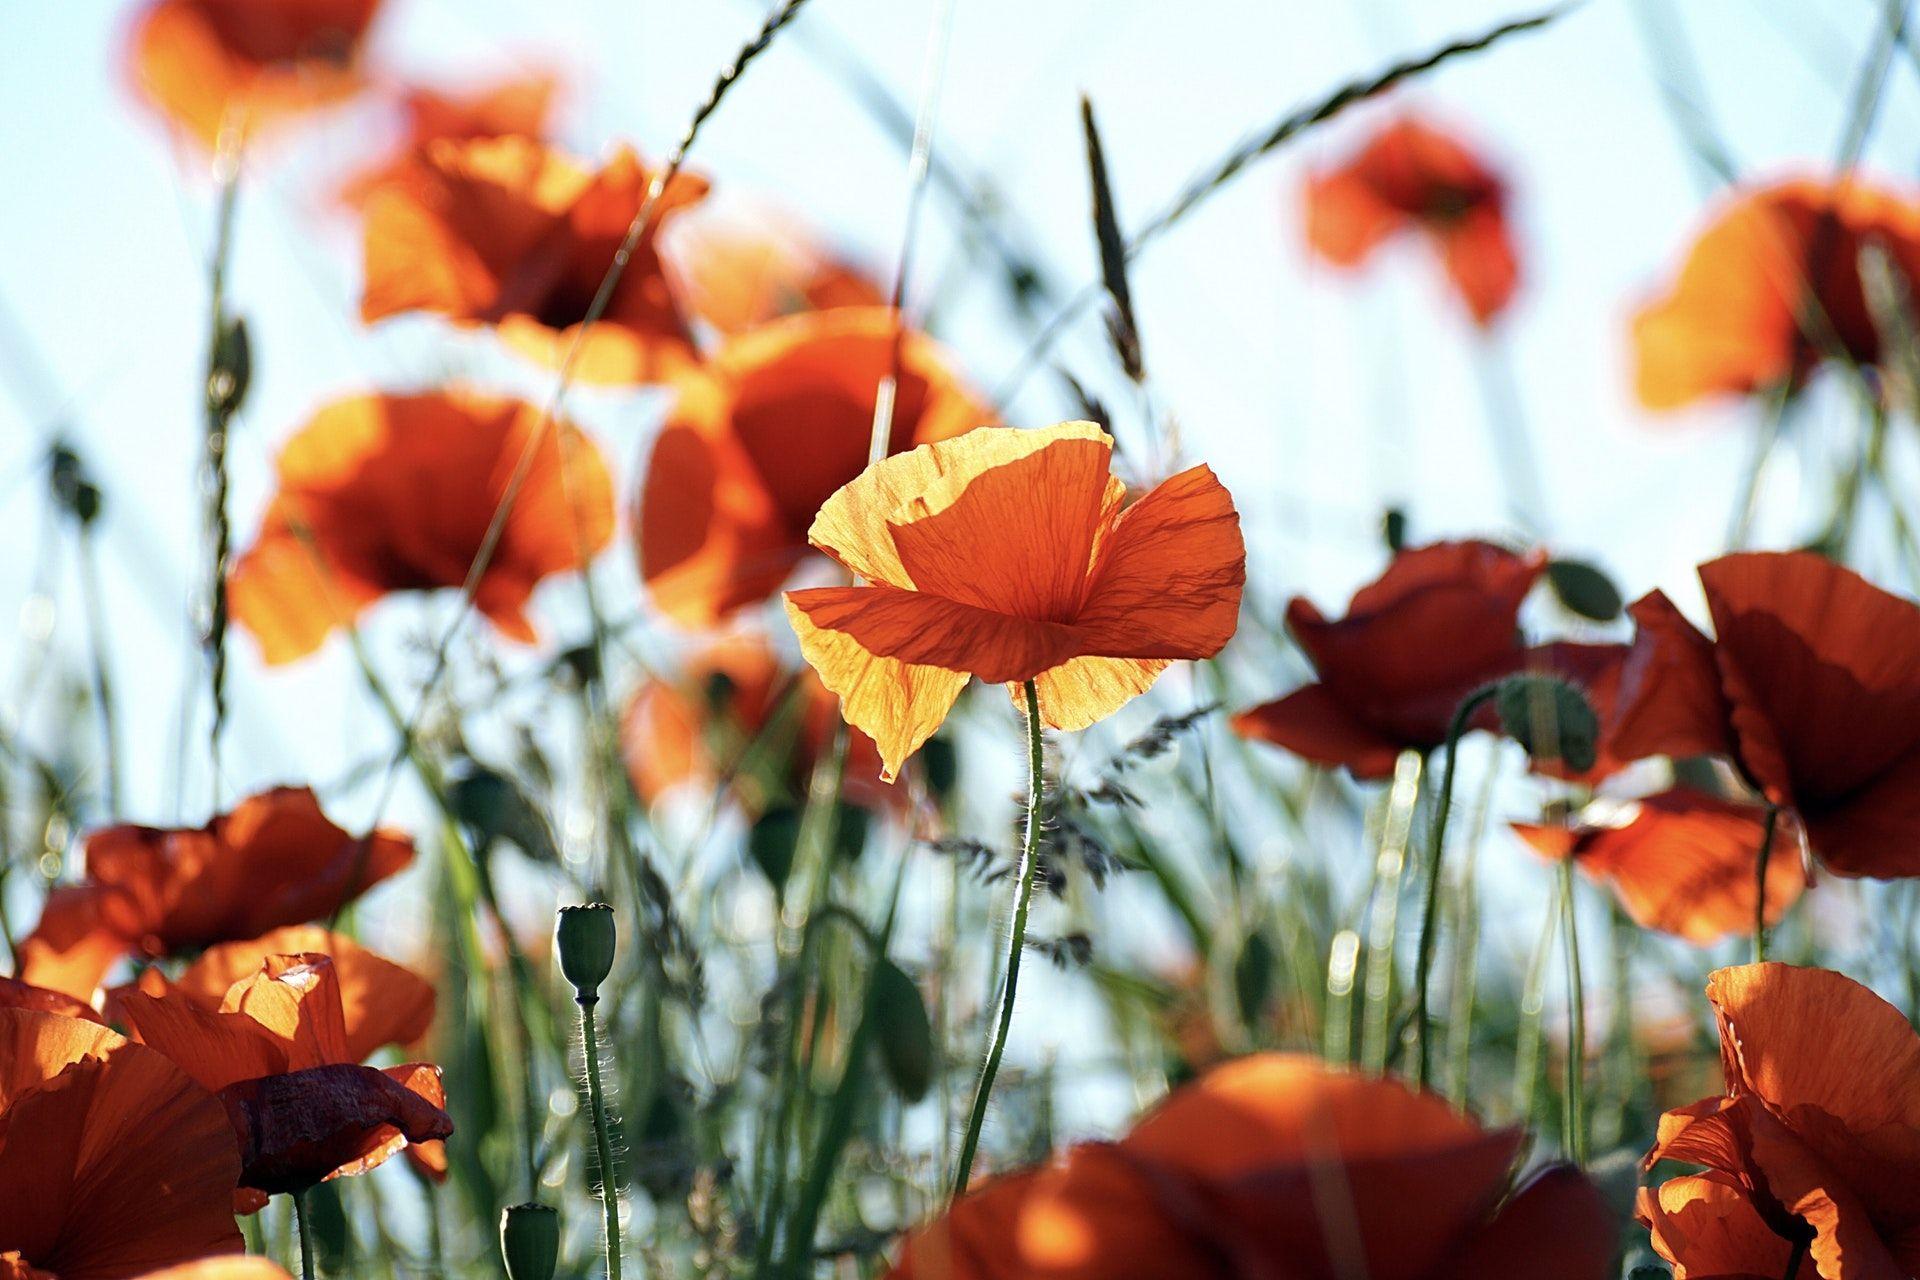 Beautiful Poppy Flower Wallpaper HD Images 1920x1280